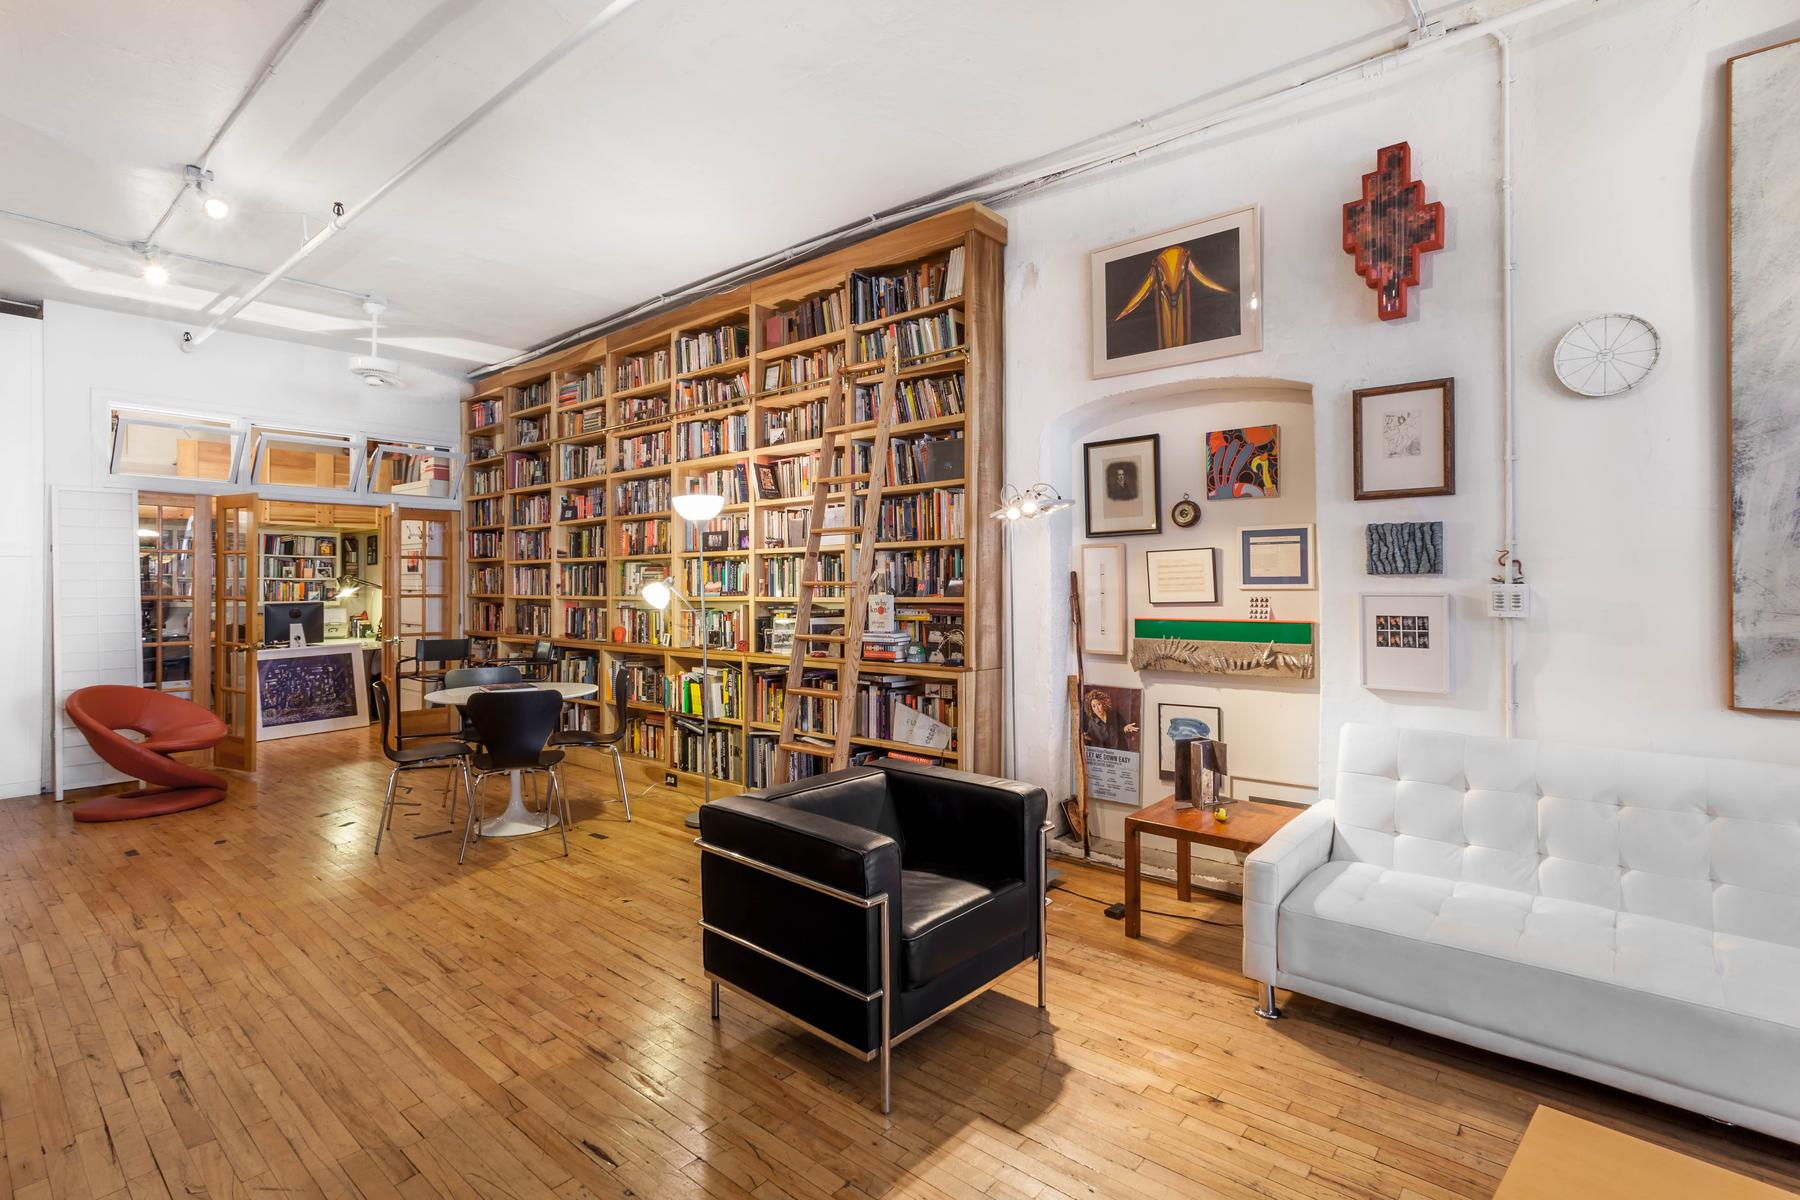 New York - Library Loft